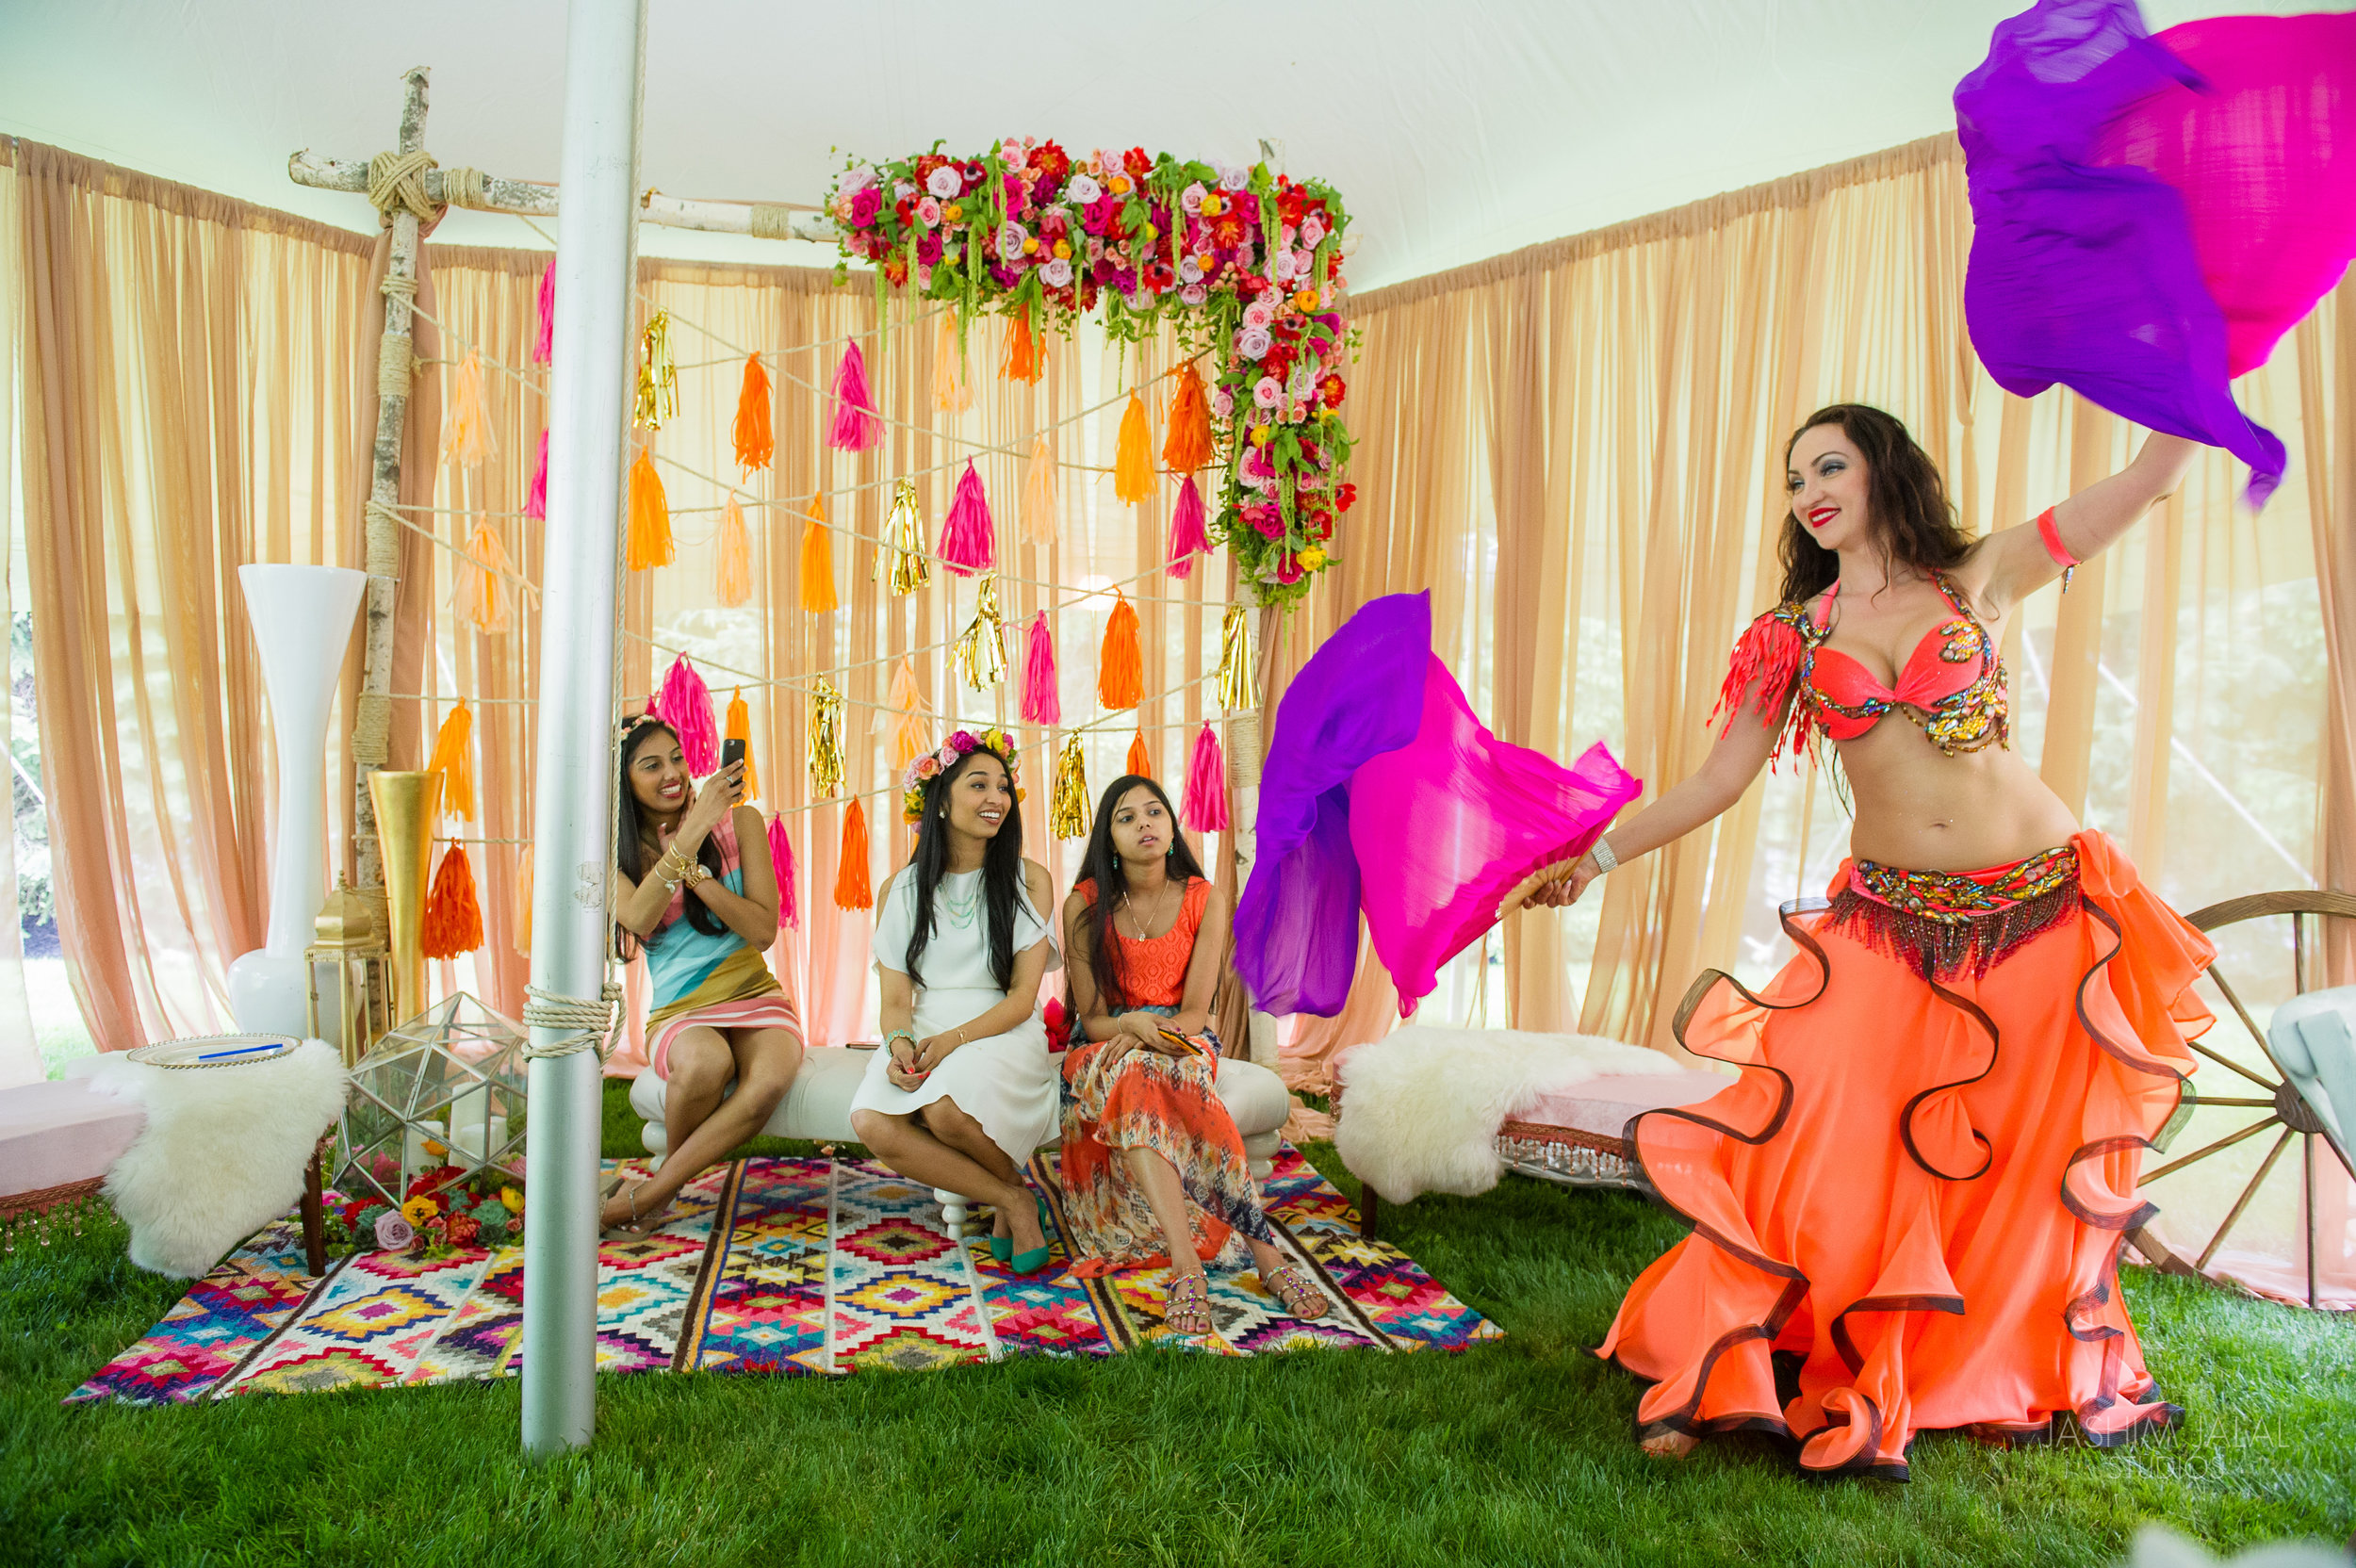 indian bridal shower boho chic summer tent event with dancer 10jpg